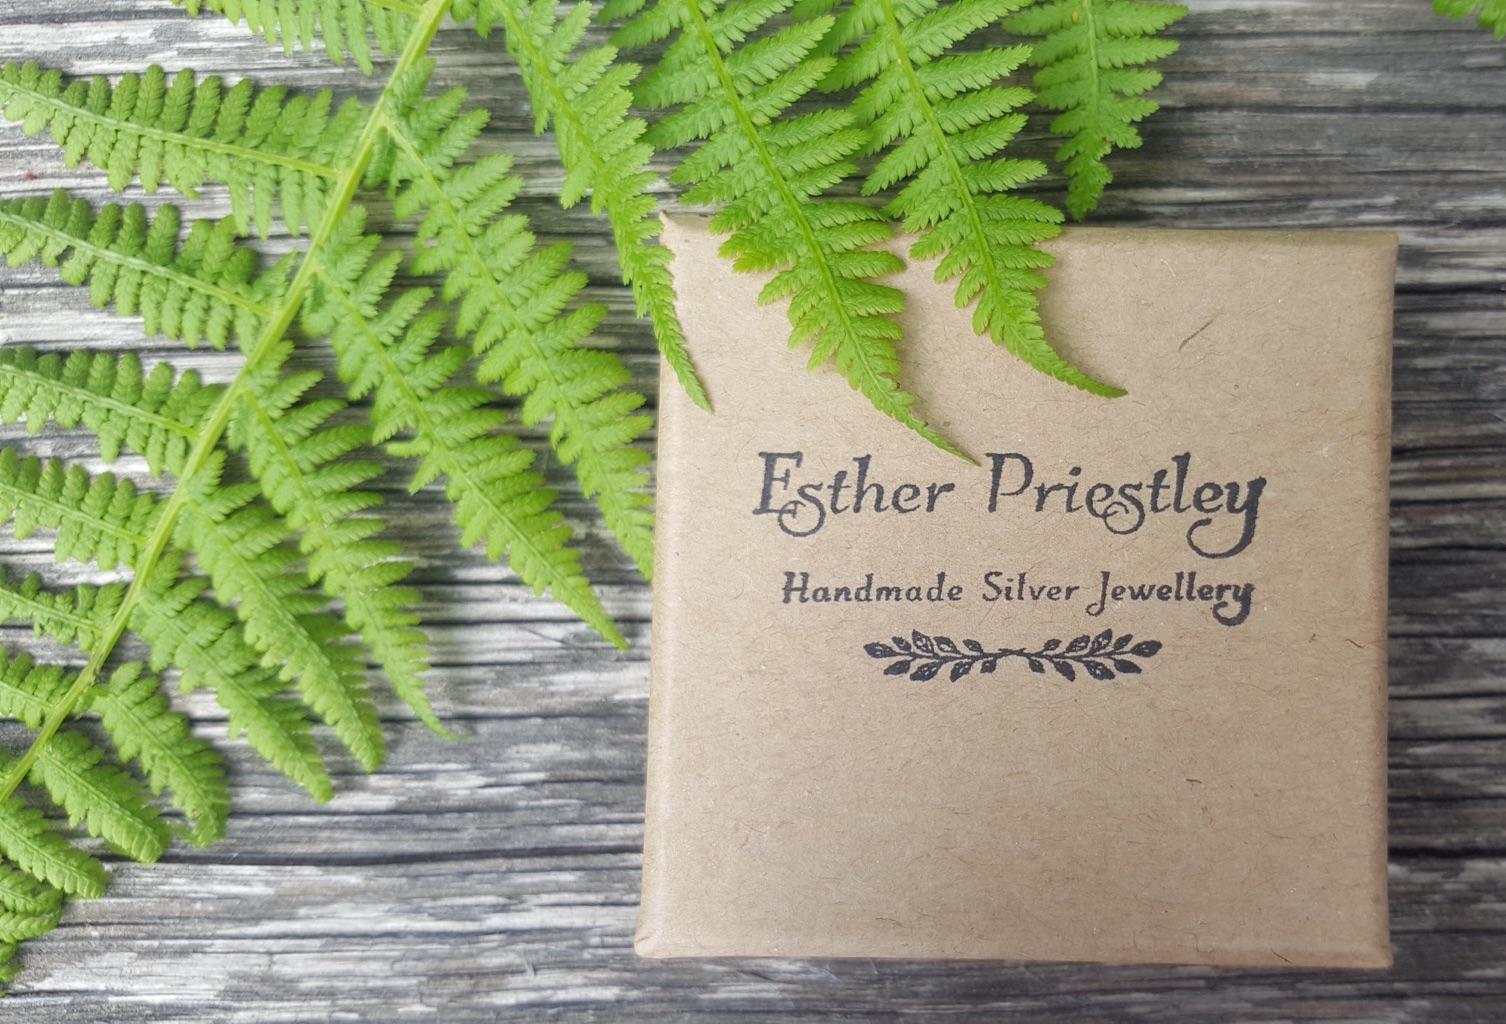 Esther Priestley